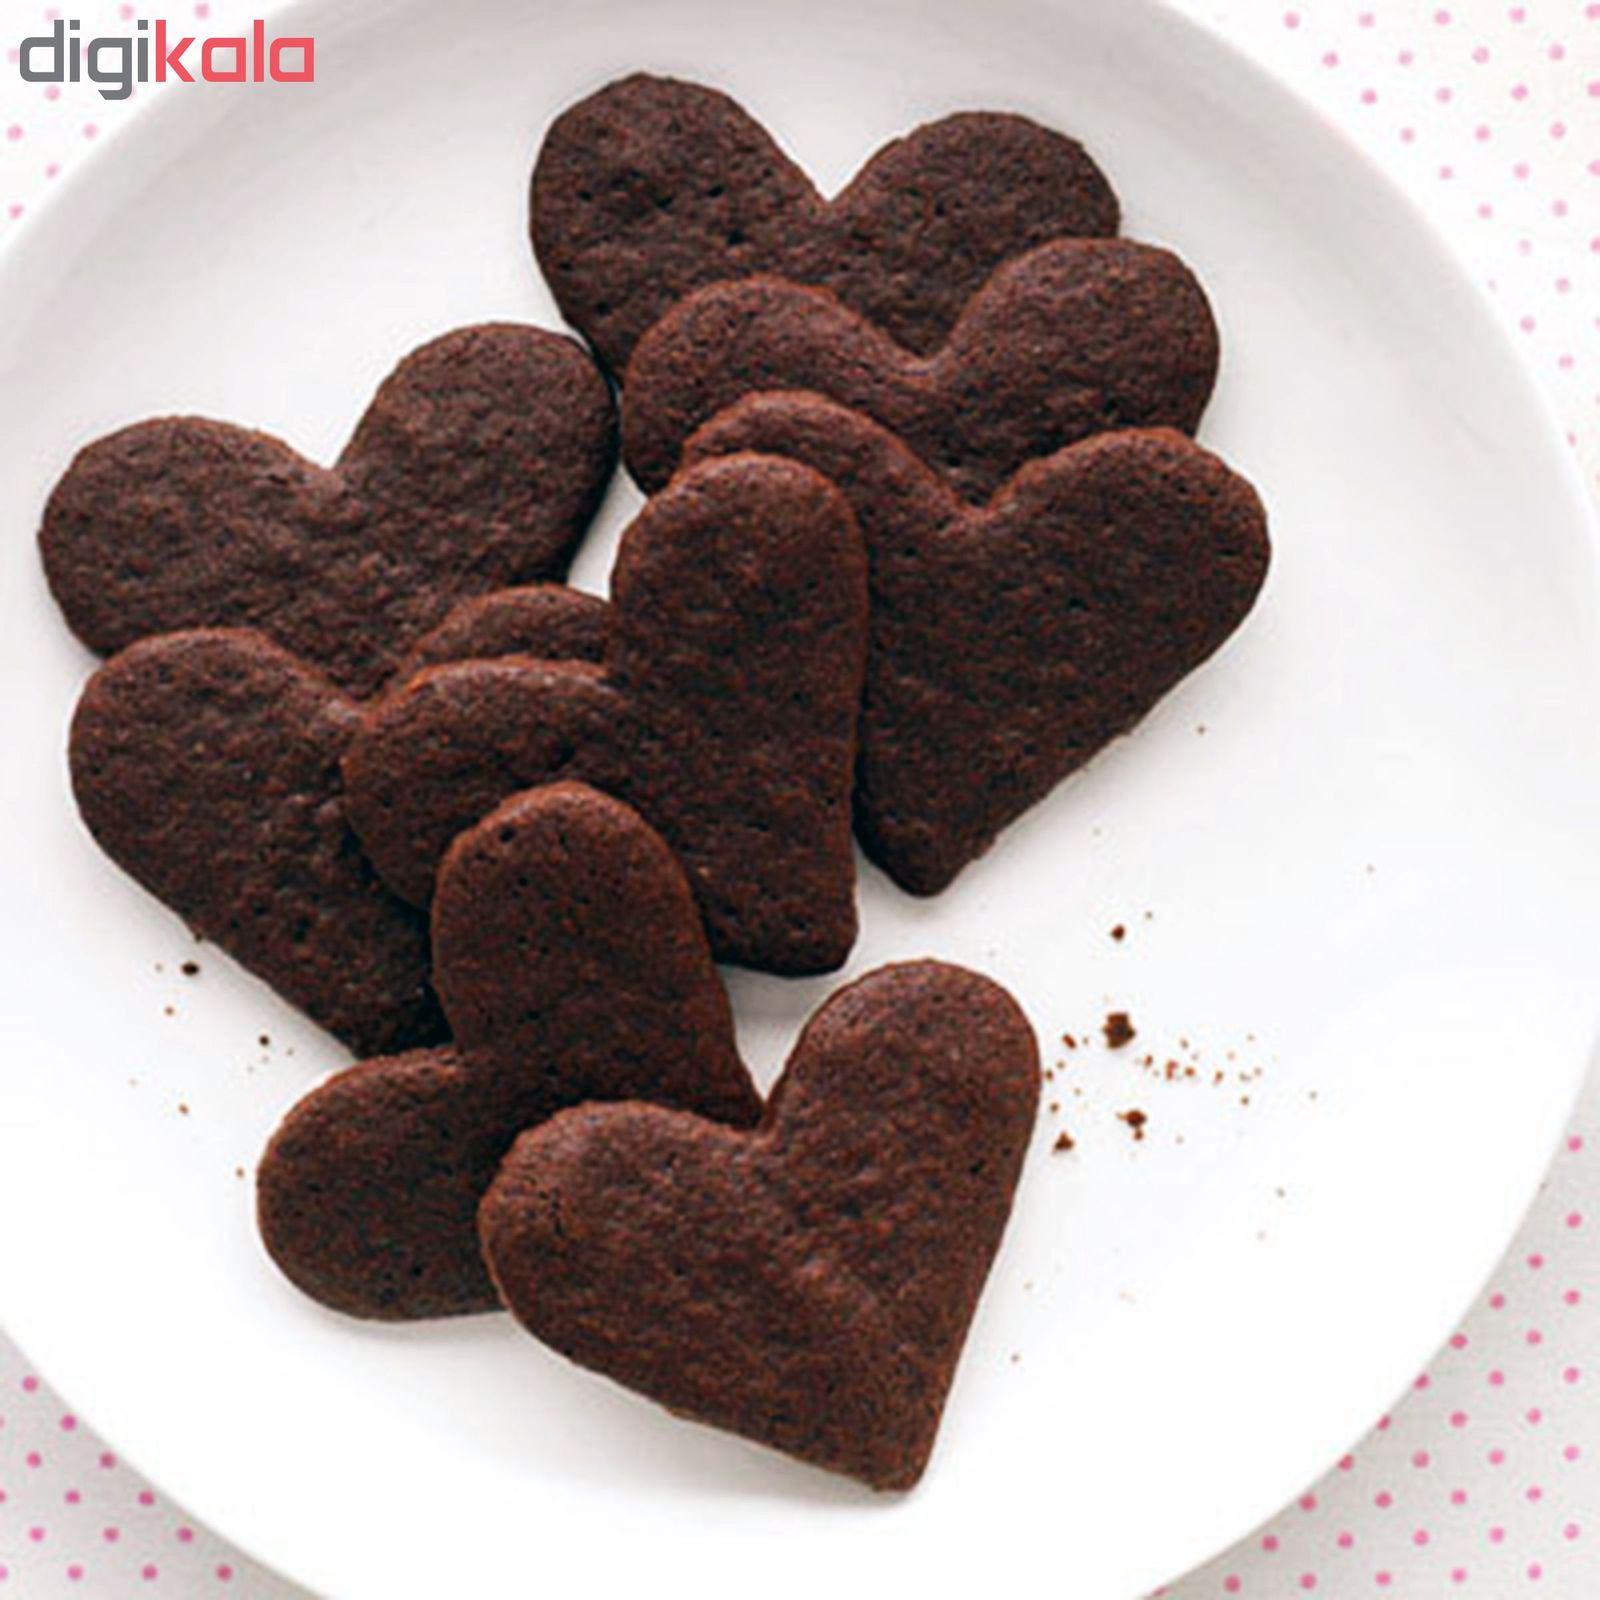 کاتر شیرینی پزی مدل Cookie Cutter بسته 12 عددی main 1 10